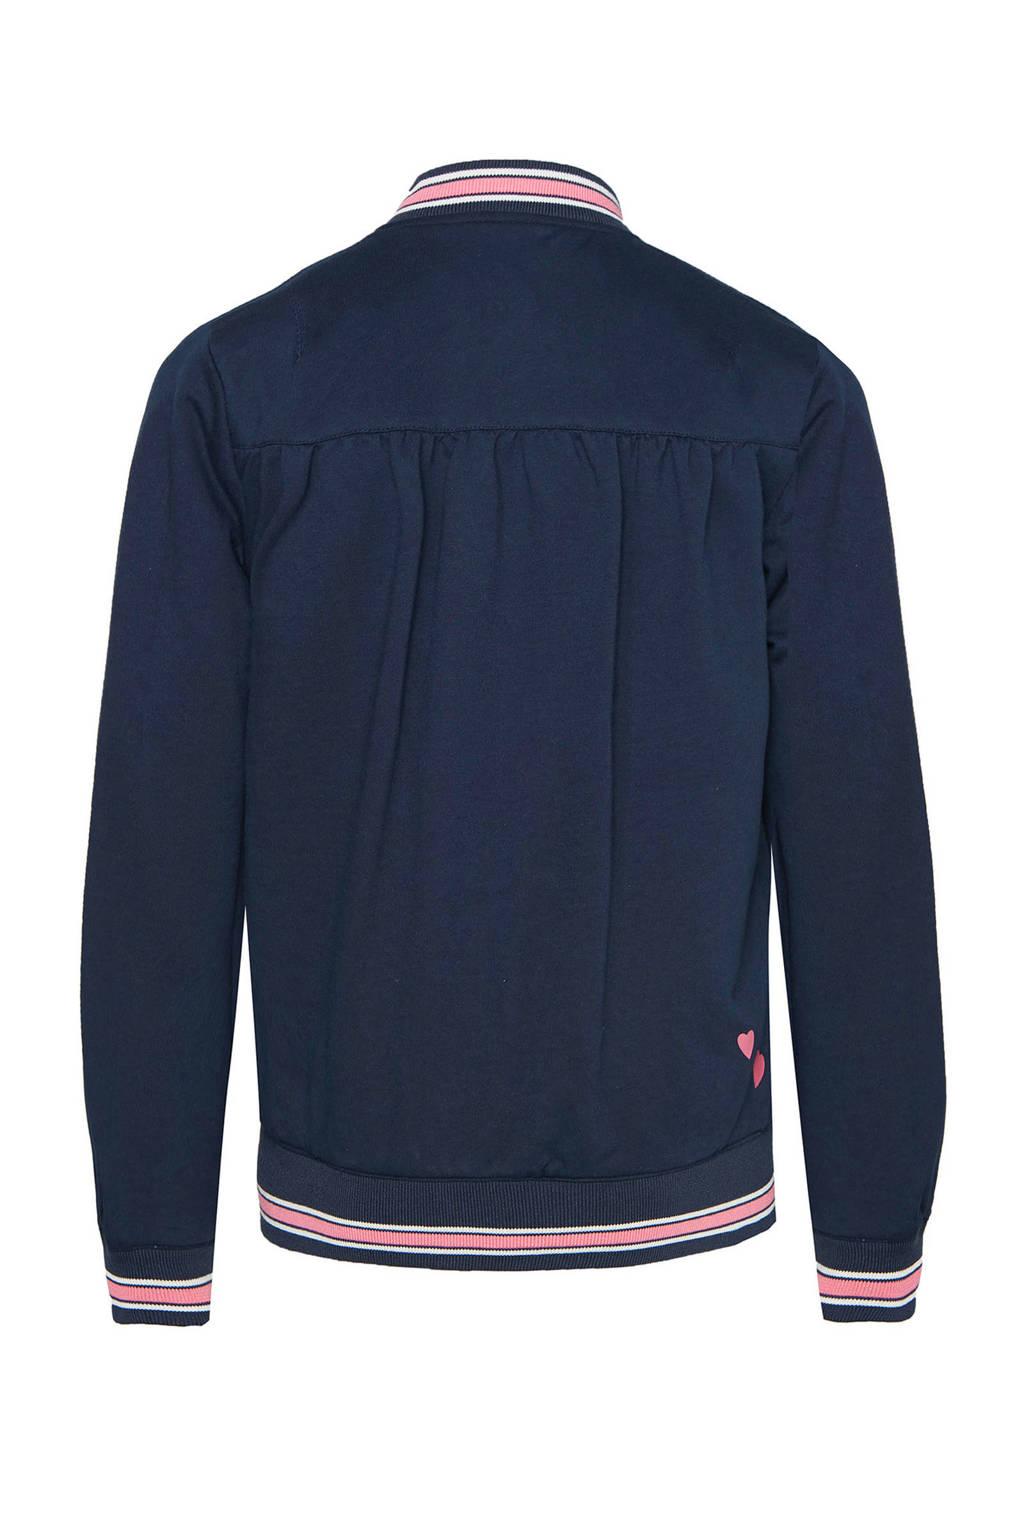 WE Fashion omkeerbare zomerjas met all over print blauw/zwart, Blauw/zwart